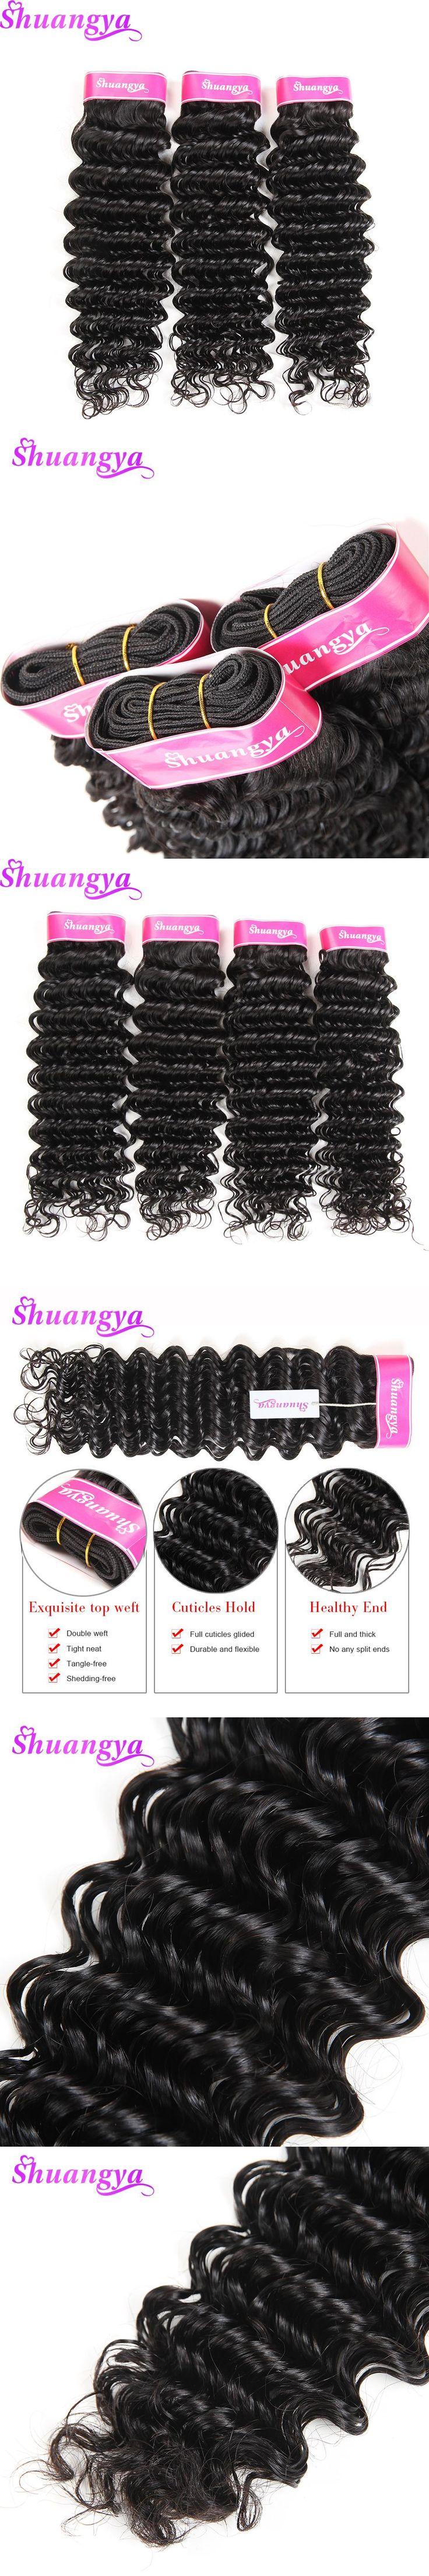 Shuangya hair Deep Wave Malaysian Hair Weave bundles Human Hair Bundles 1pcs/lot Non remy Hair Extension Can Buy 3 Or 4 Bundles